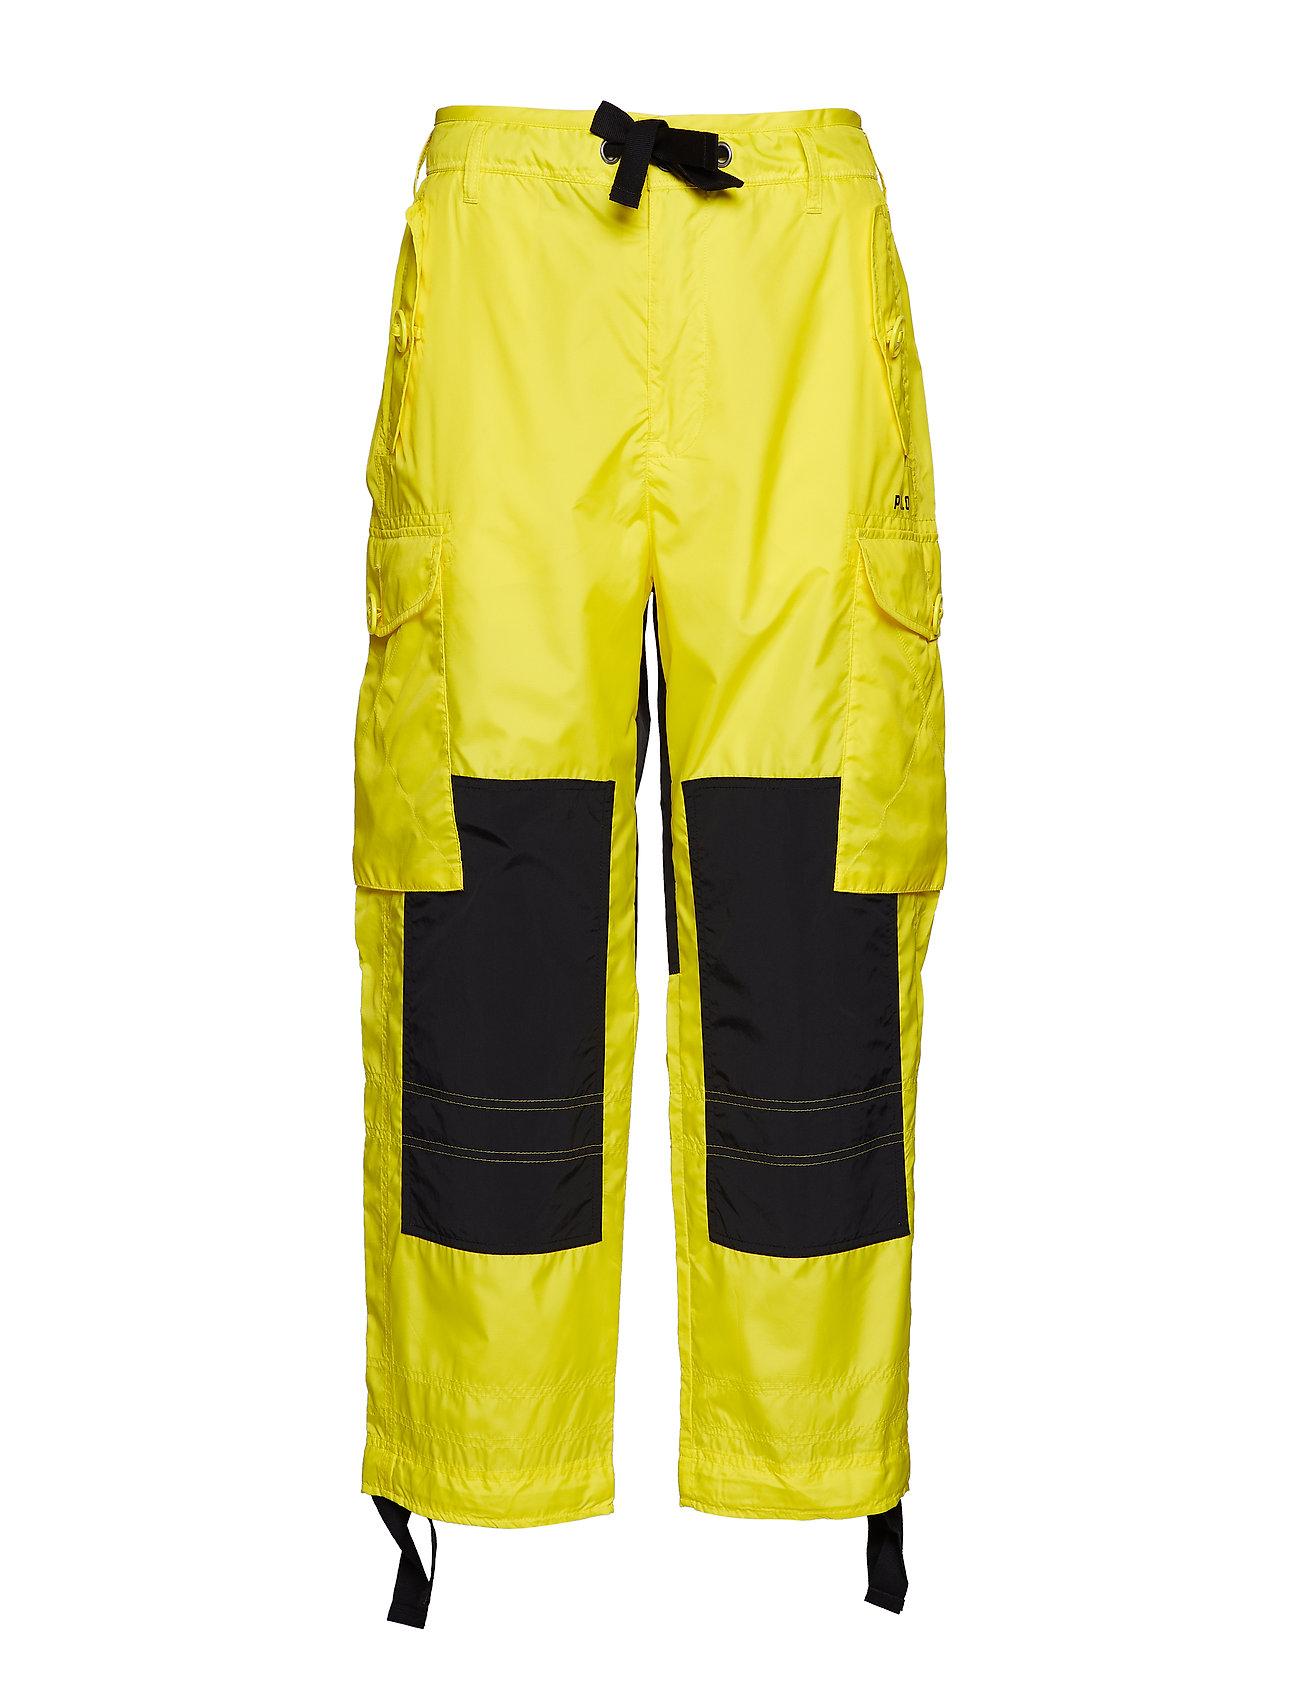 Polo Ralph Lauren Ripstop Cargo Pant - OPTIC YELLOW/POLO